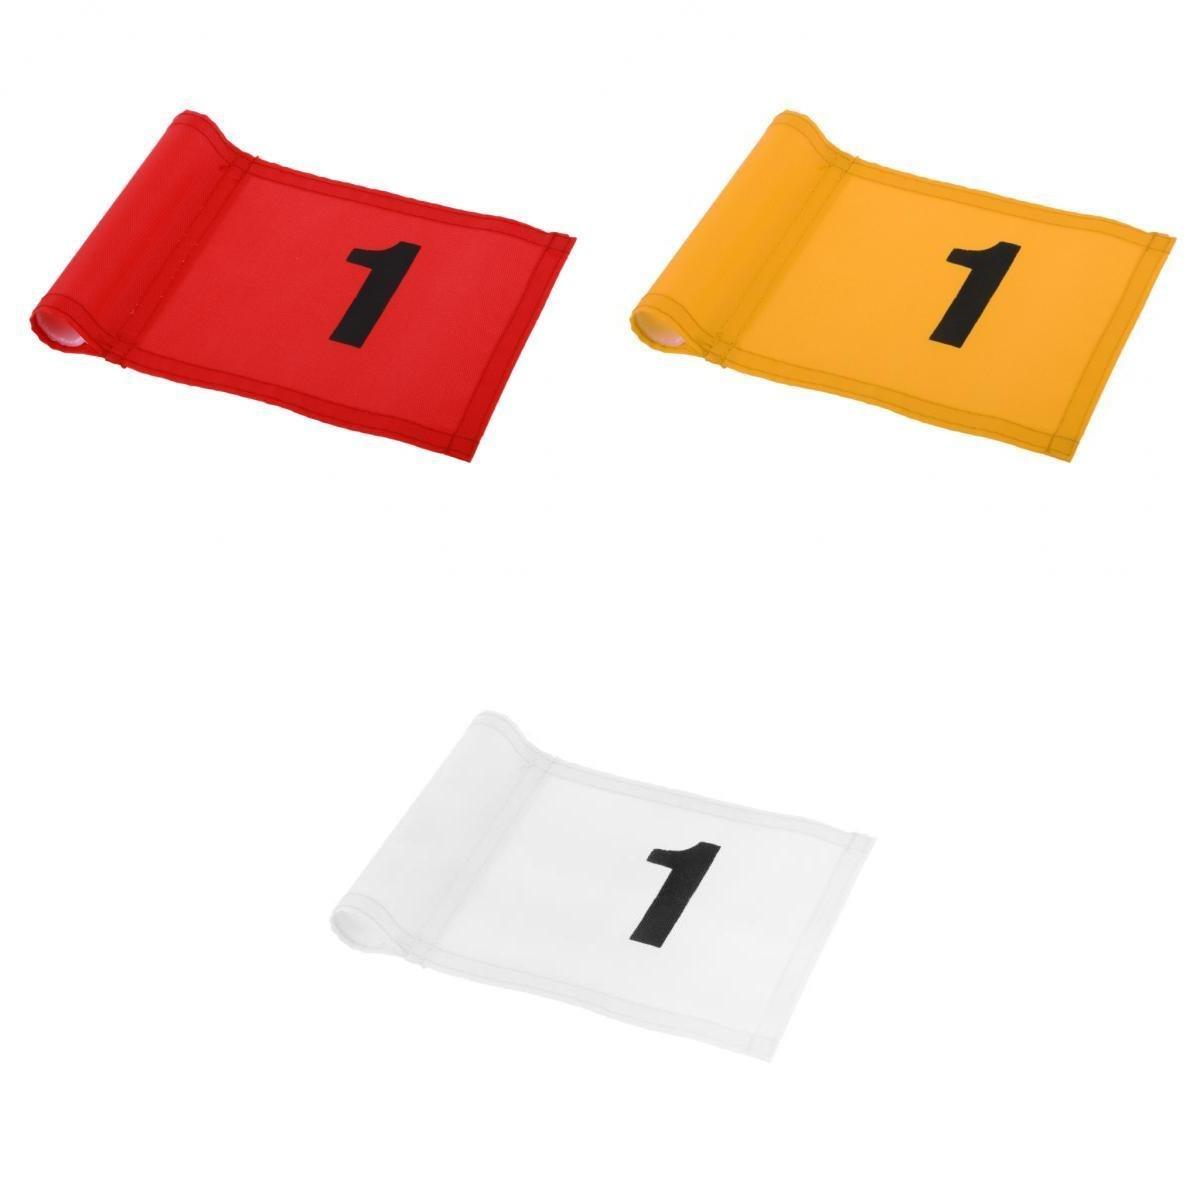 Baosity Pack 3 Golf Putting Green Flag Golf Target Flag for Golfer Backyard Training Gear Accessories by Baosity (Image #10)